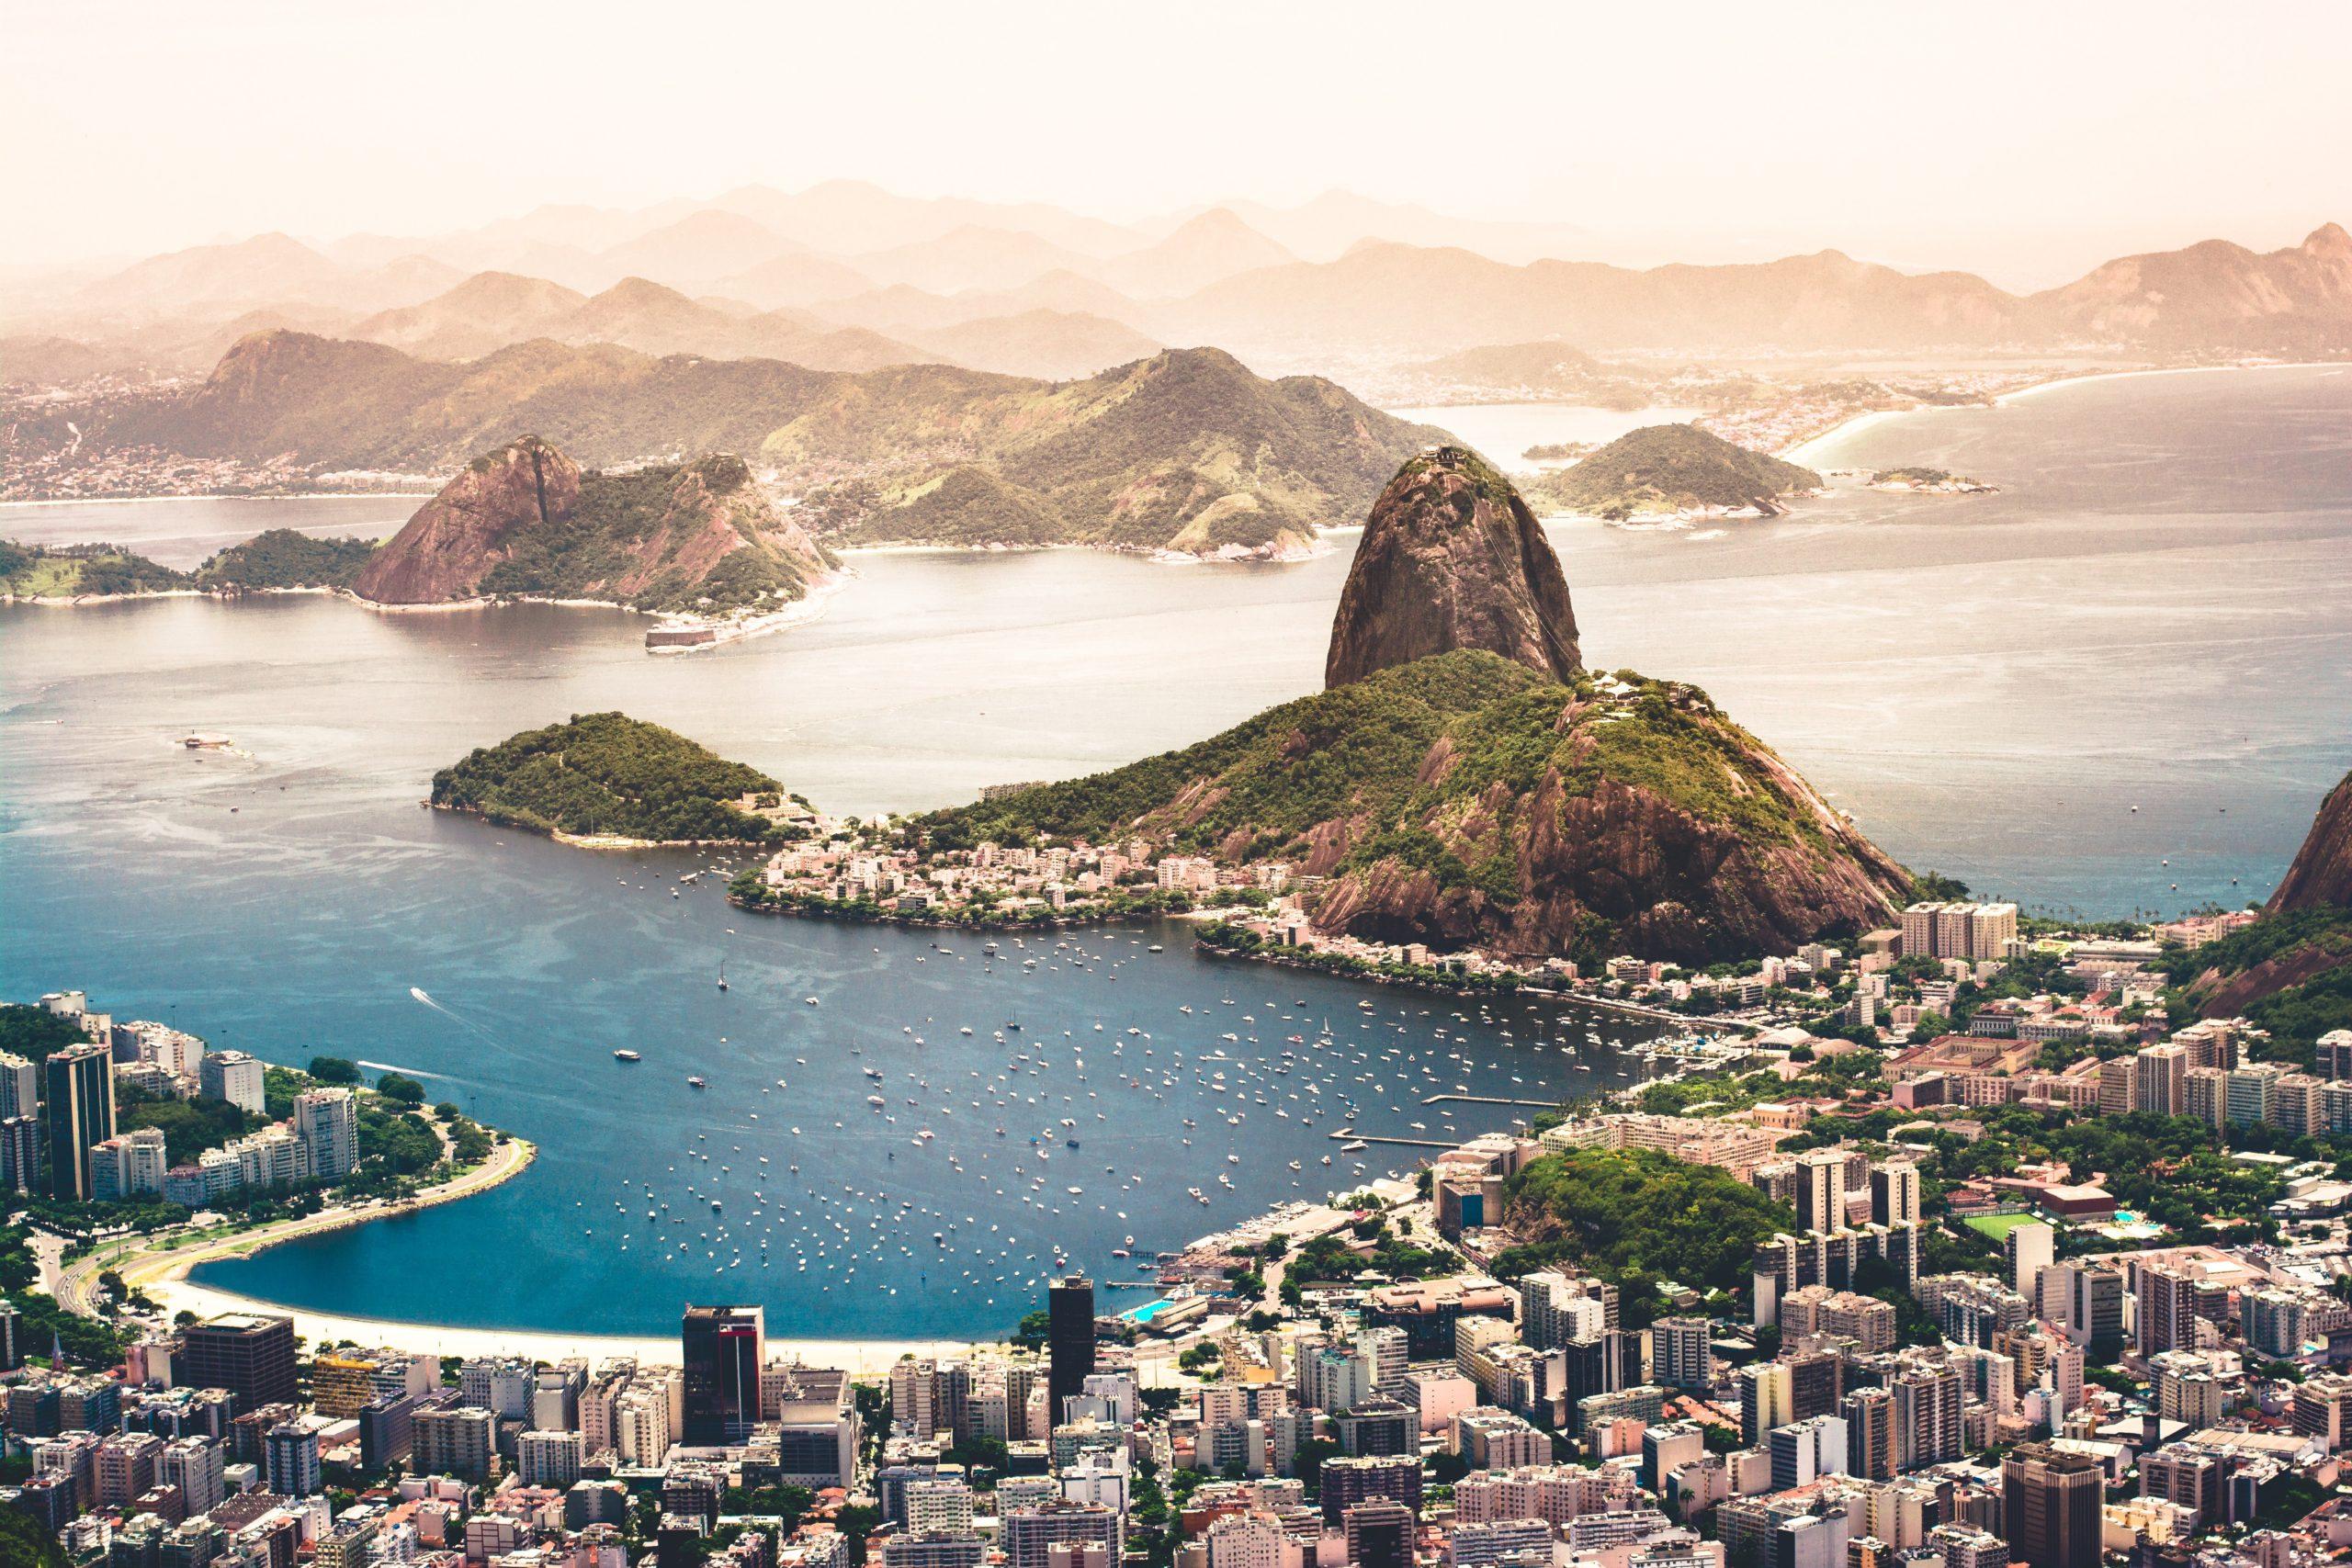 agustin diaz 7F65HDP0 E0 unsplash scaled Visit Rio de Janeiro: A 2021 City of Marvel And Beauty